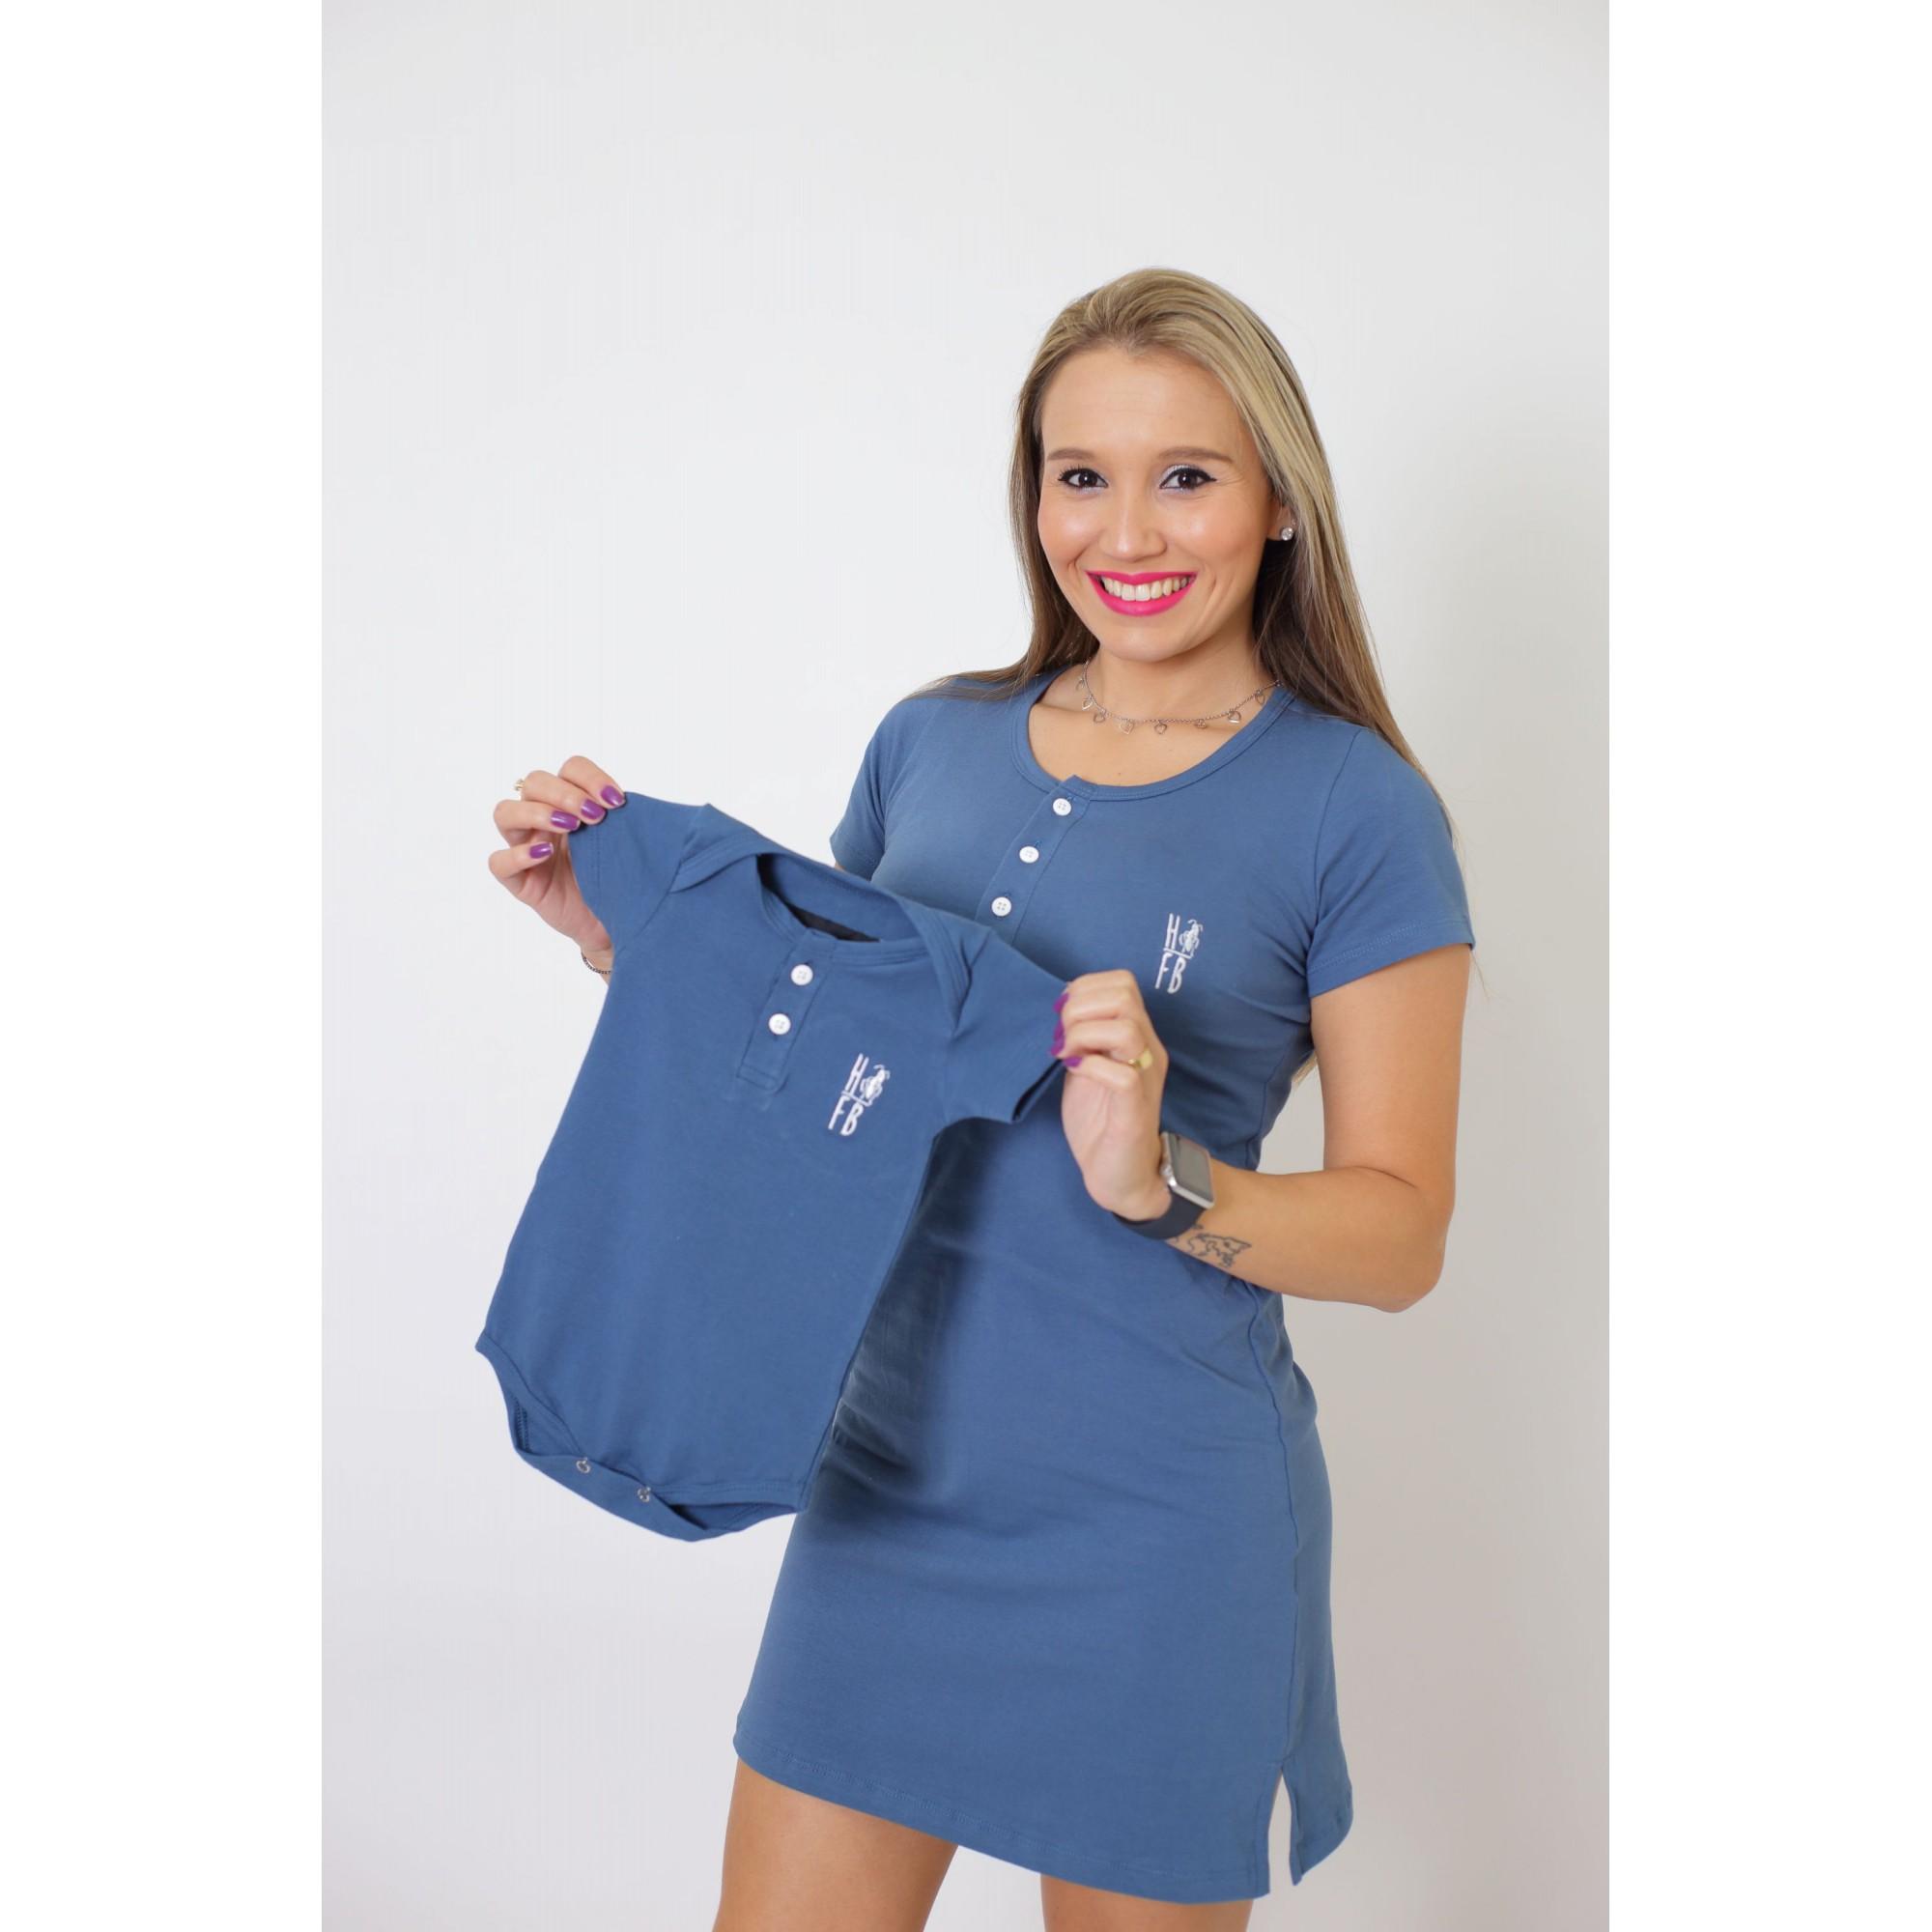 MÃE E FILHOS > Kit Vestido + Body Unissex Infantil - Henley - Azul Petróleo [Coleção Tal Mãe Tal Filhos]  - Heitor Fashion Brazil